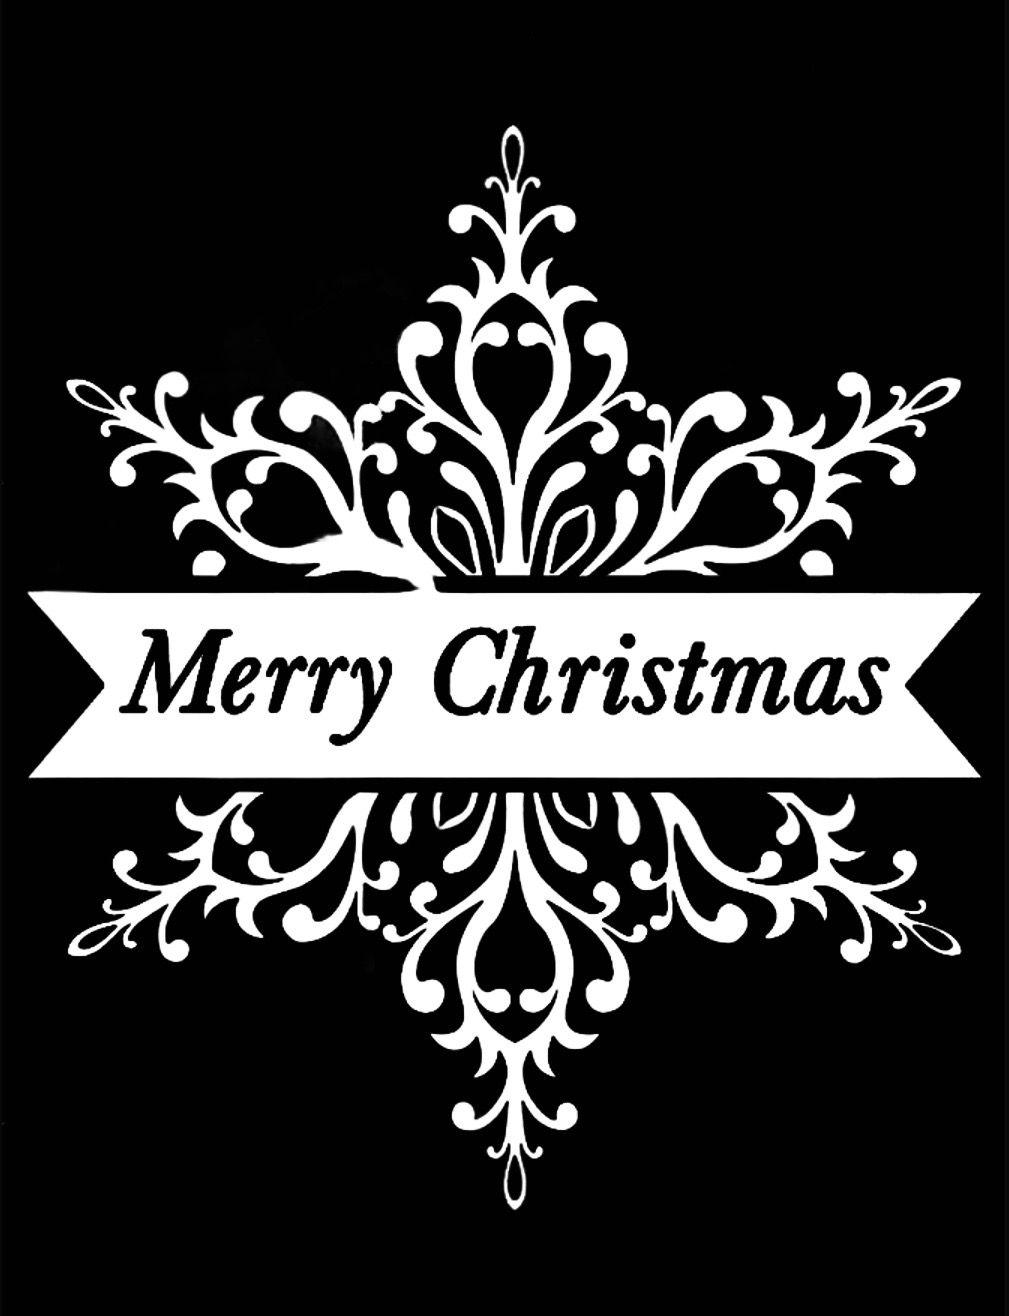 Pin by Ромалетта on виньетки | Merry christmas, Merry ...